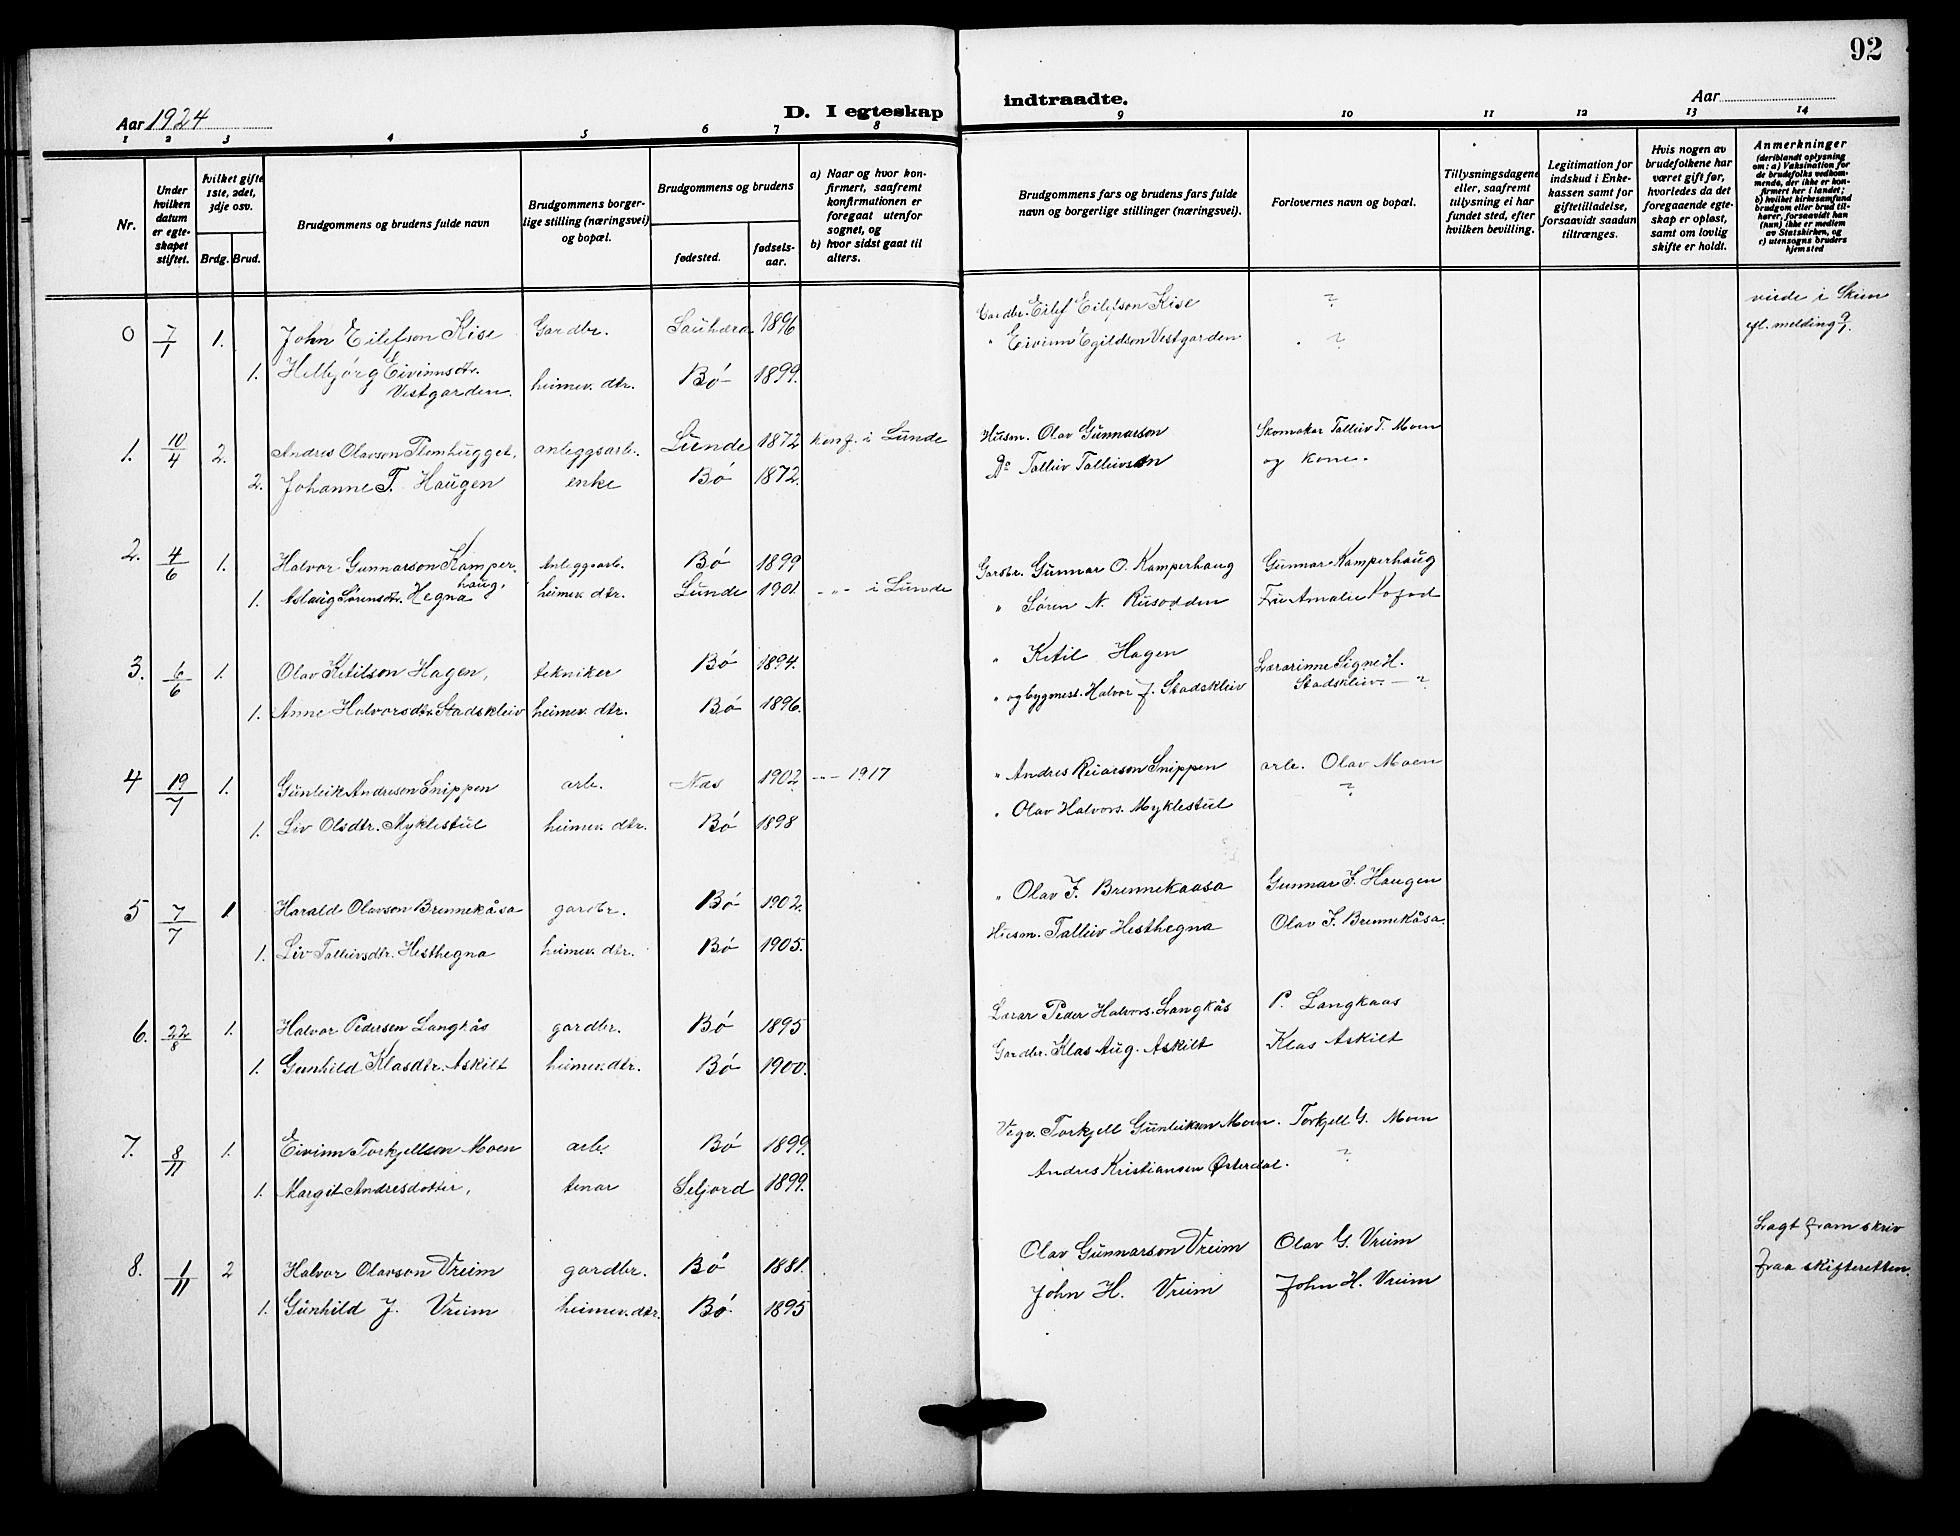 SAKO, Bø kirkebøker, G/Ga/L0008: Klokkerbok nr. 8, 1920-1930, s. 92